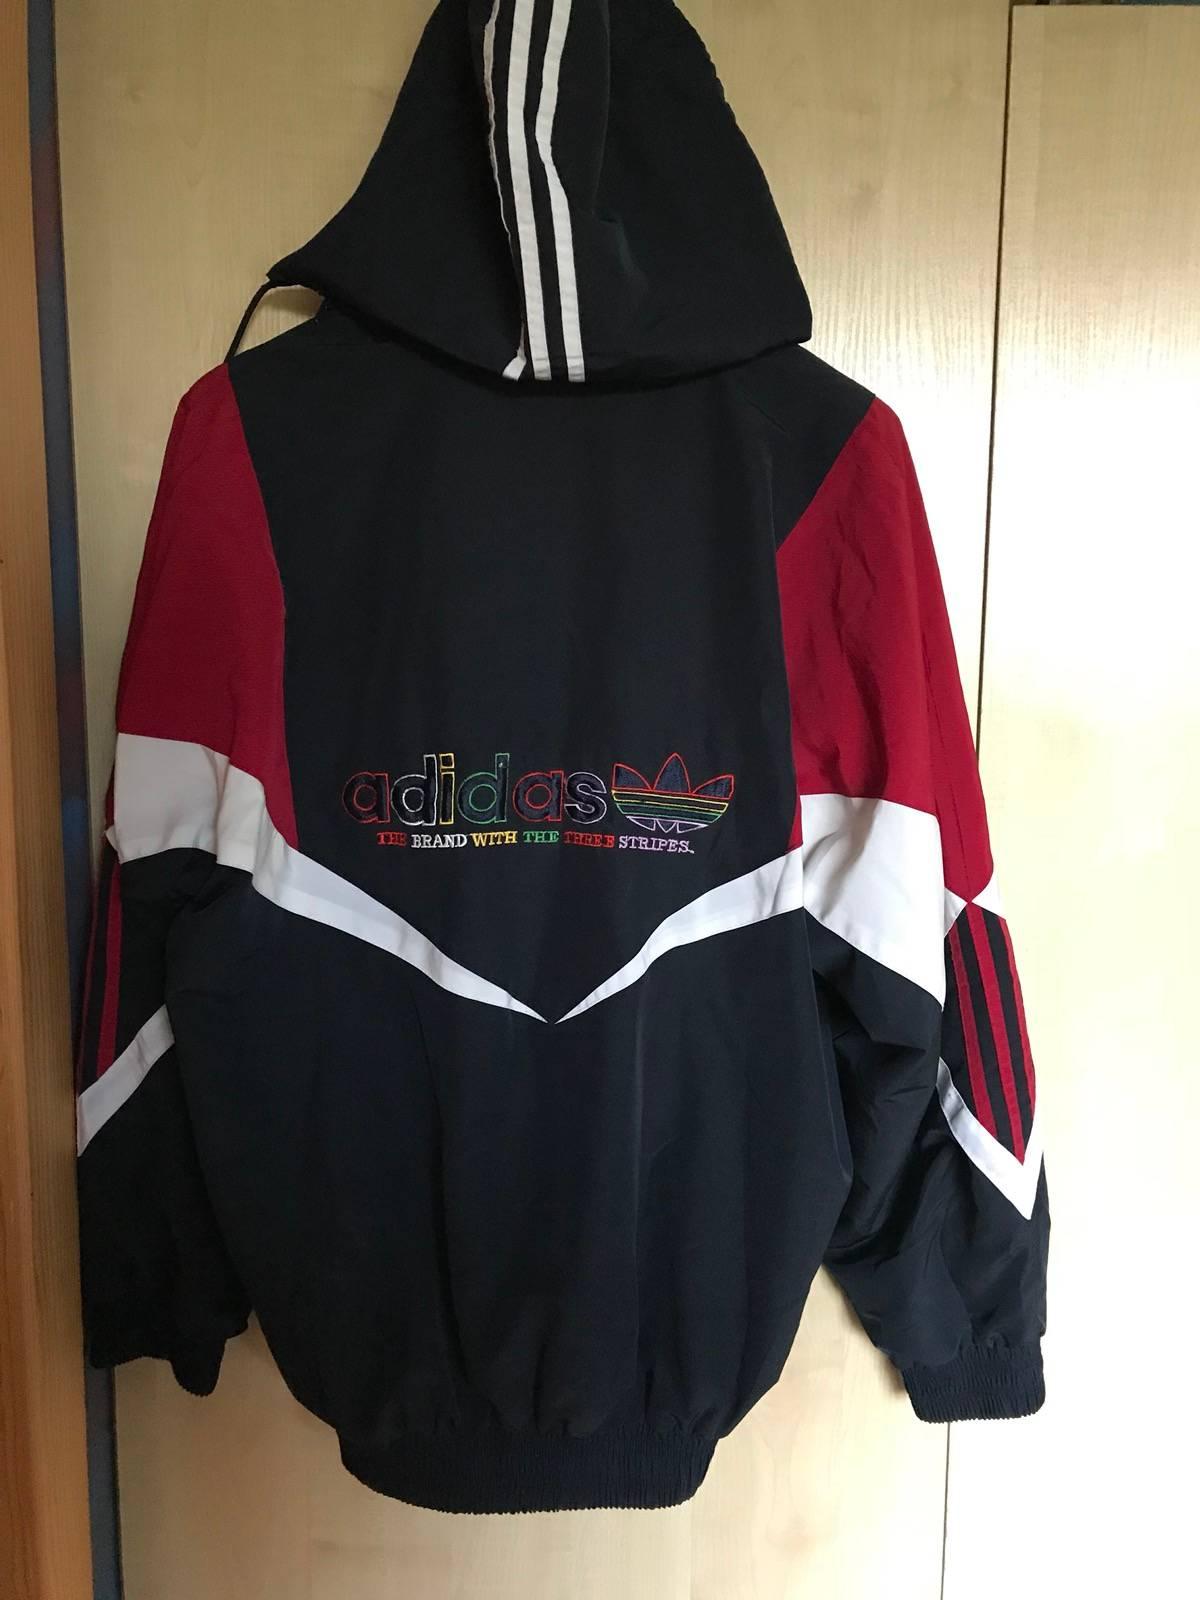 directorio magia Para aumentar  Adidas Vintage Rasta Caribbean Bob Marley Color Red Black Striped 3 Stripes Adidas  Jacket 90s | Grailed